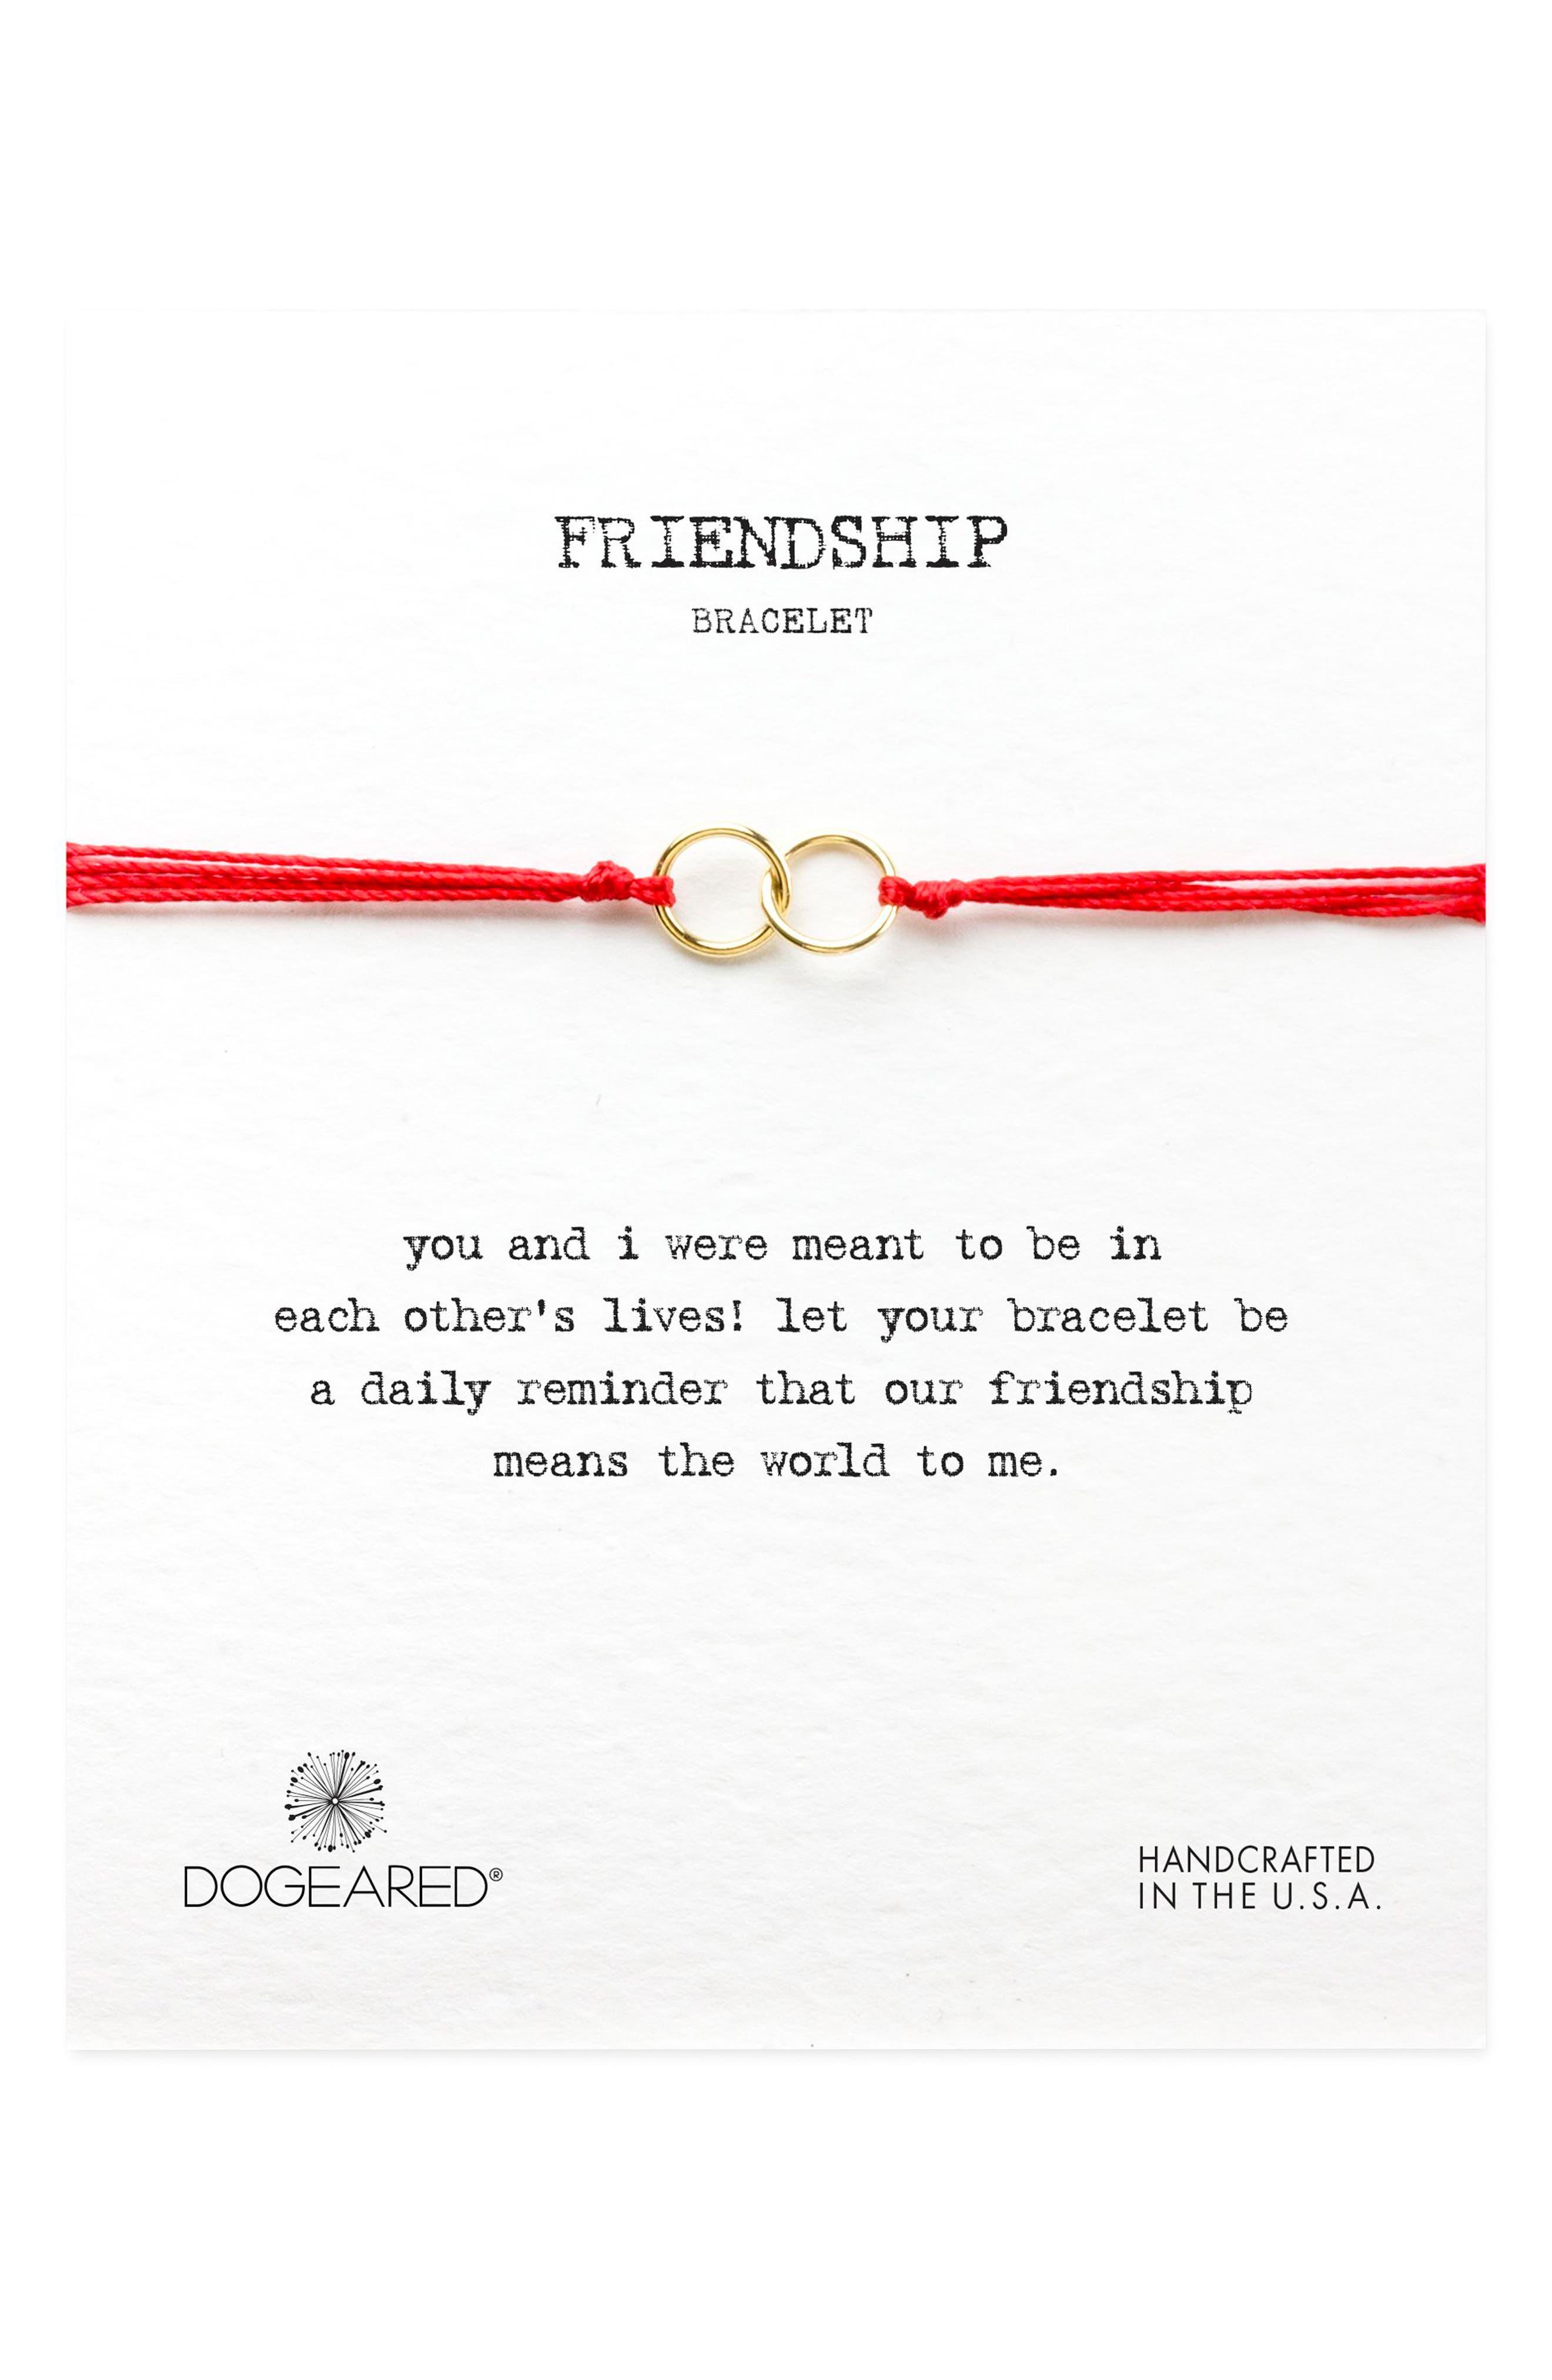 Double Linked Friendship Bracelet,                             Main thumbnail 1, color,                             RED / GOLD